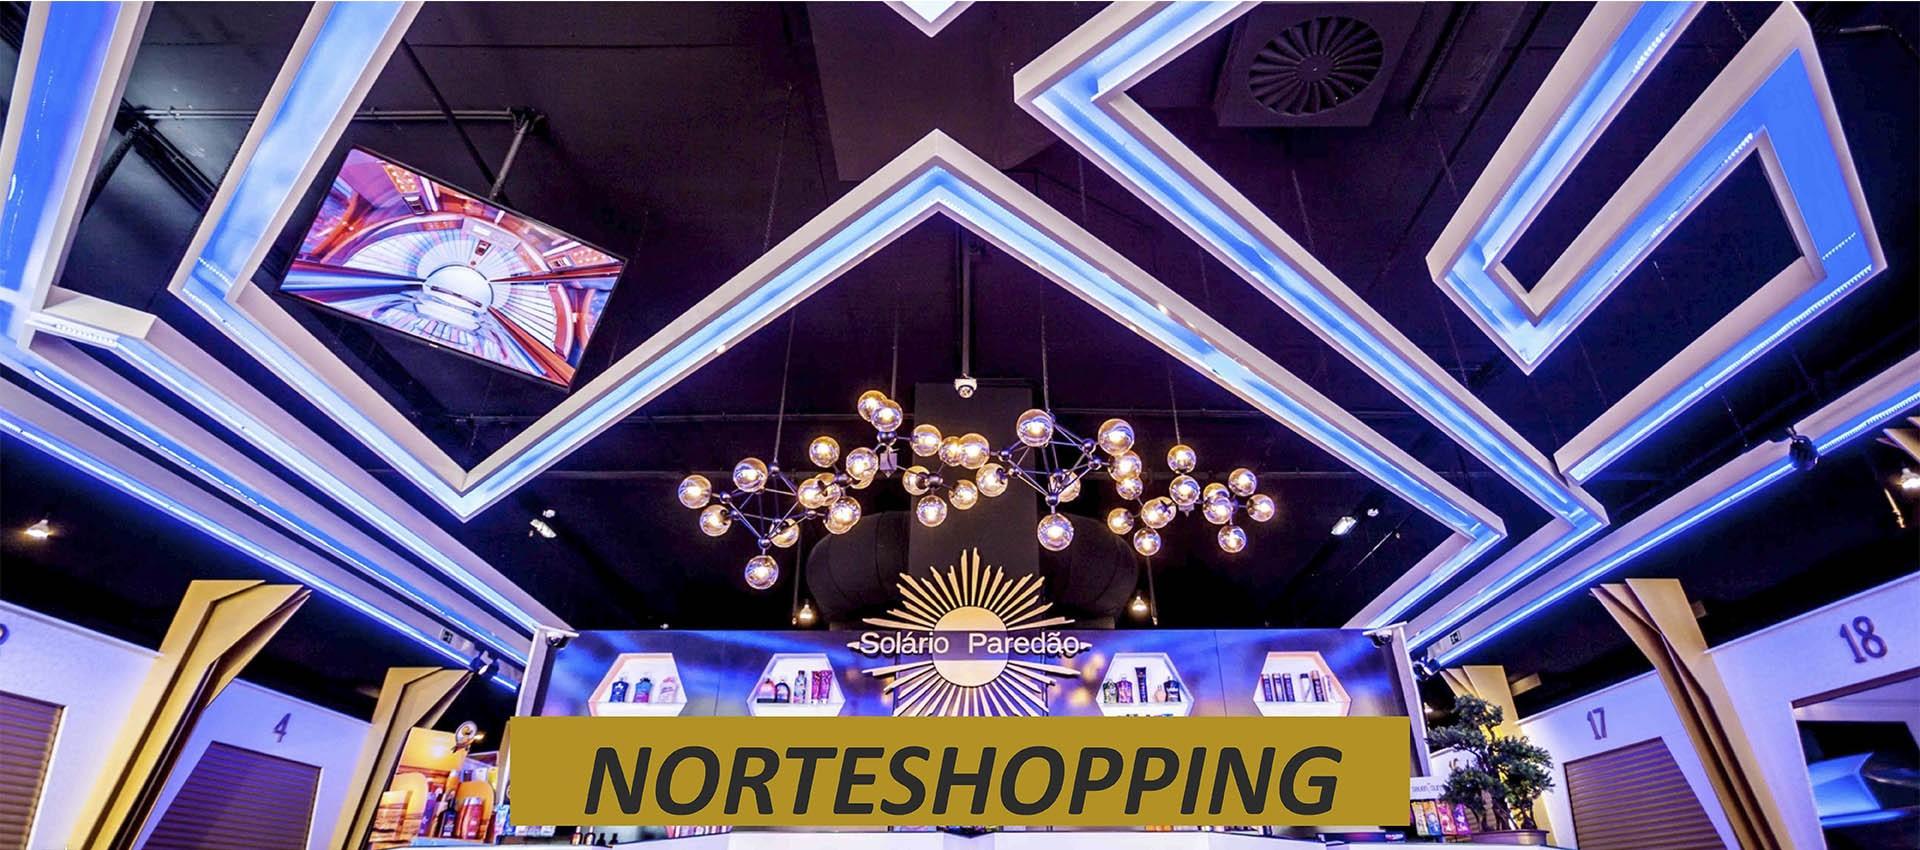 Norteshopping